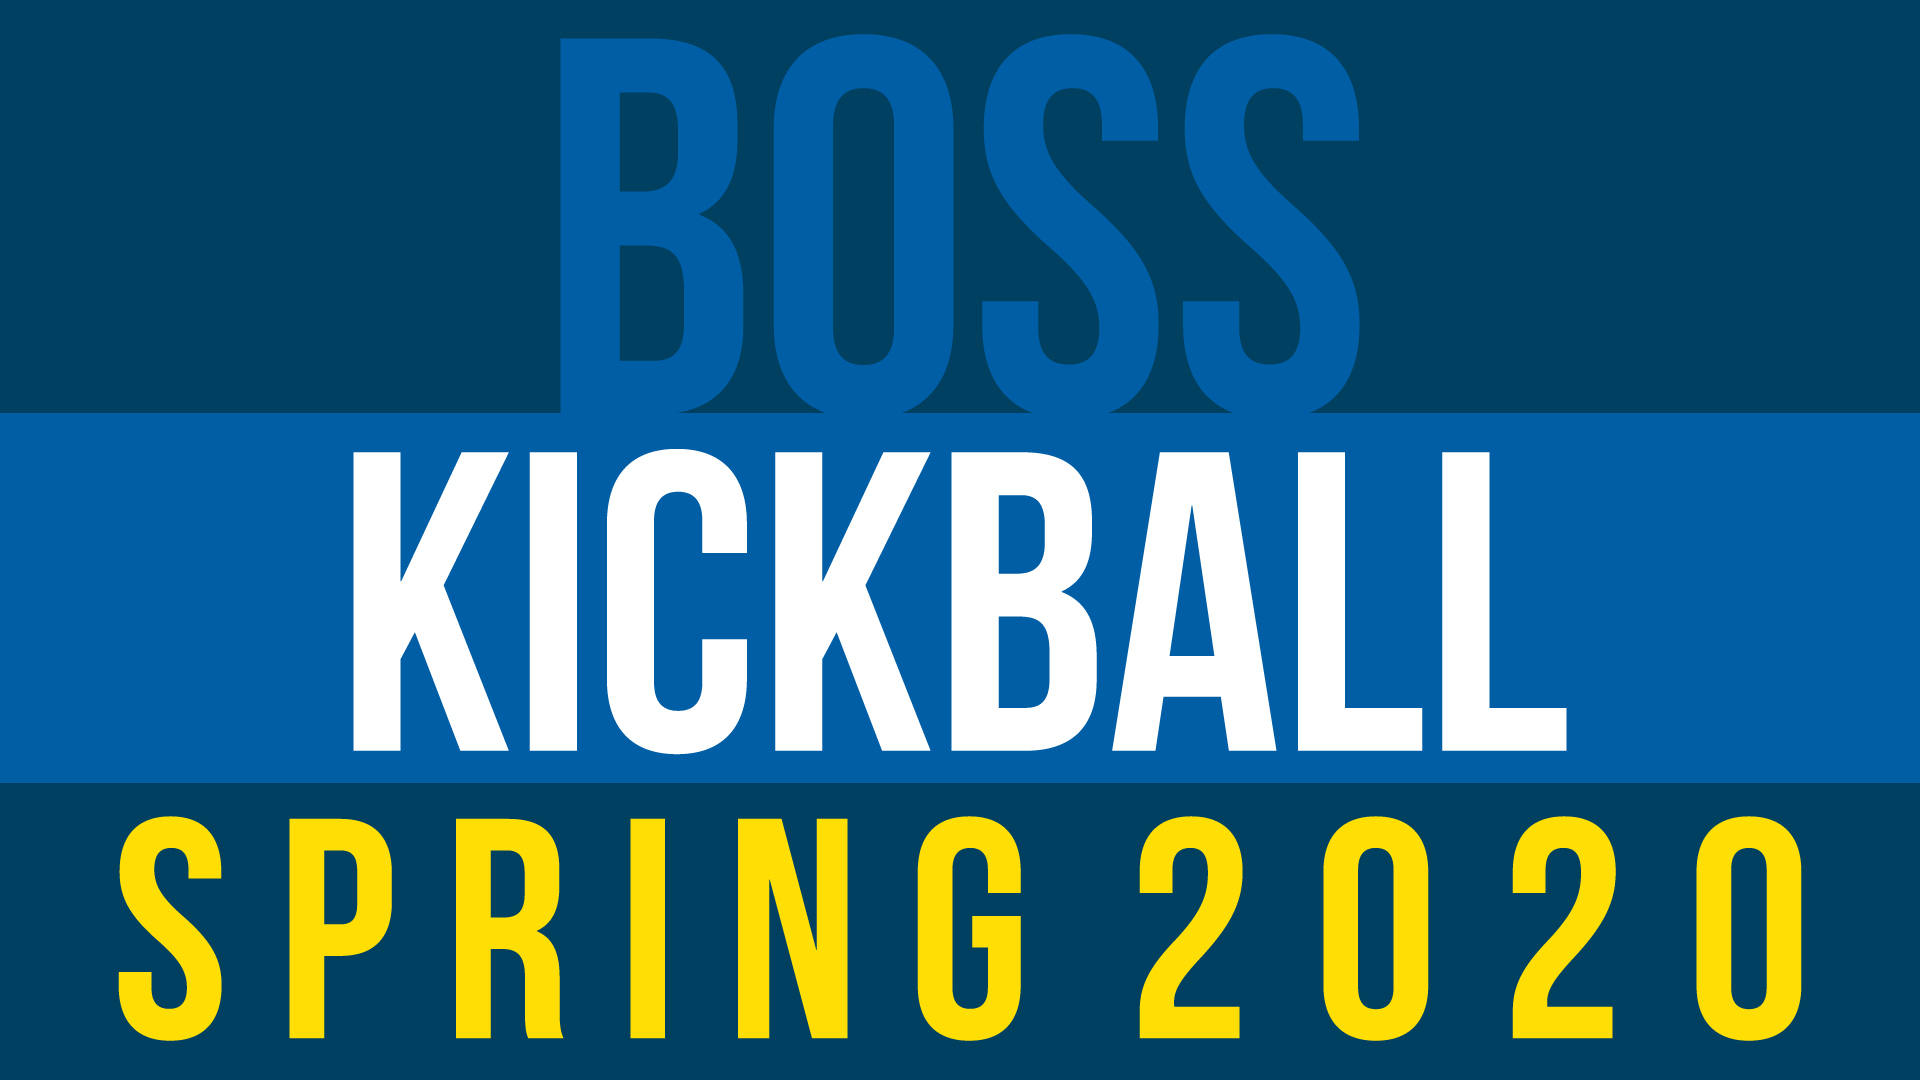 Spring Kickball Tournament